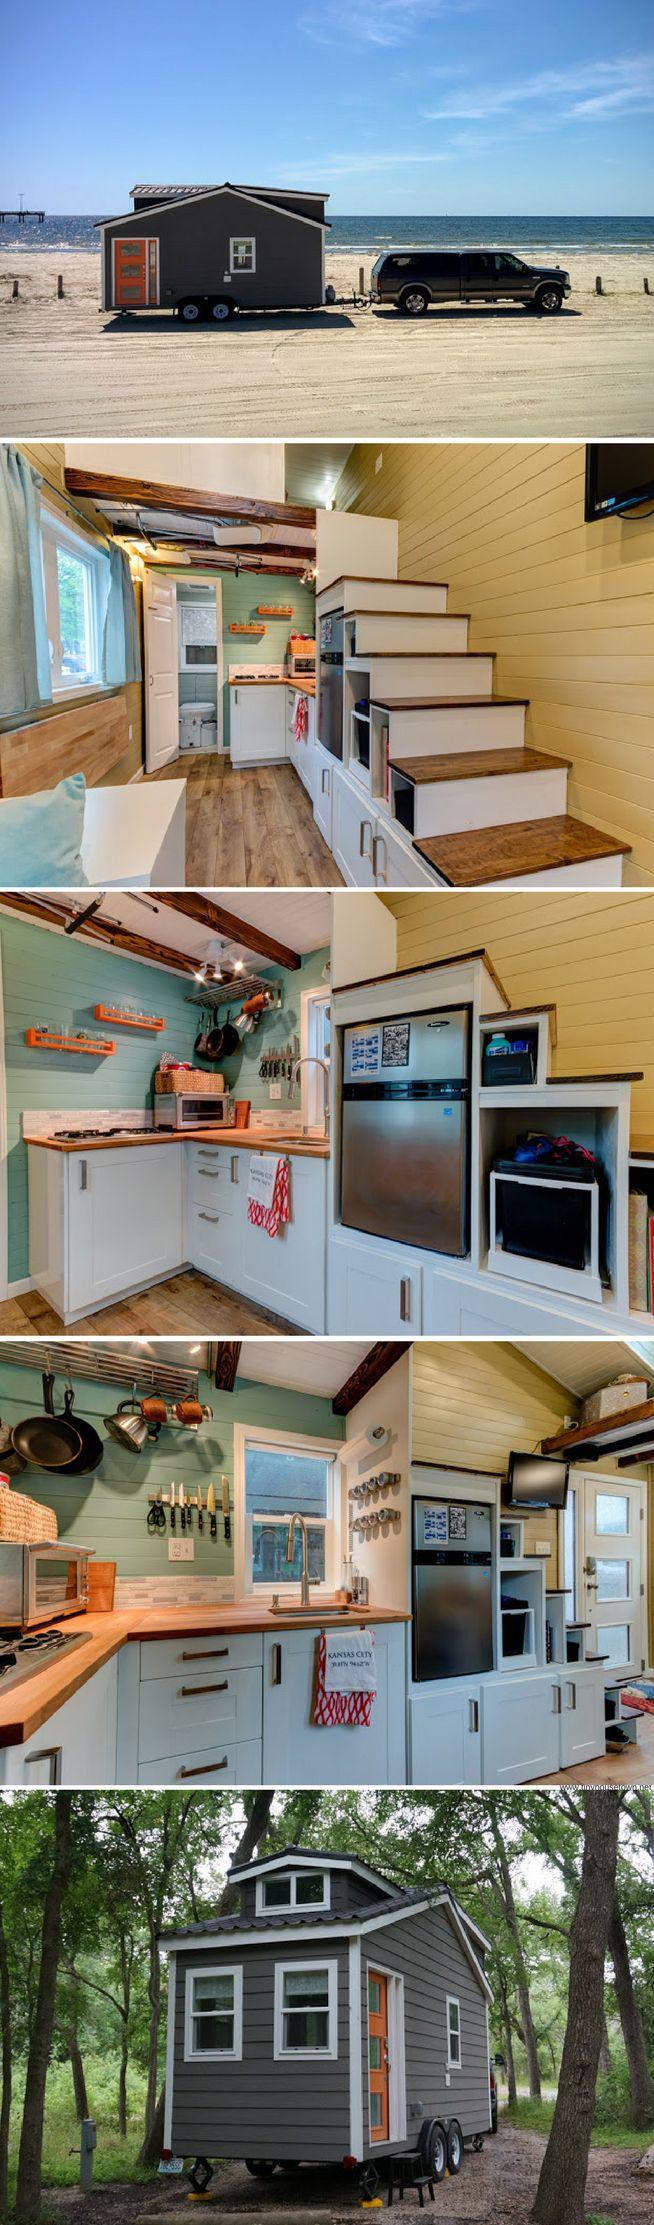 The Wanderlust Tiny House